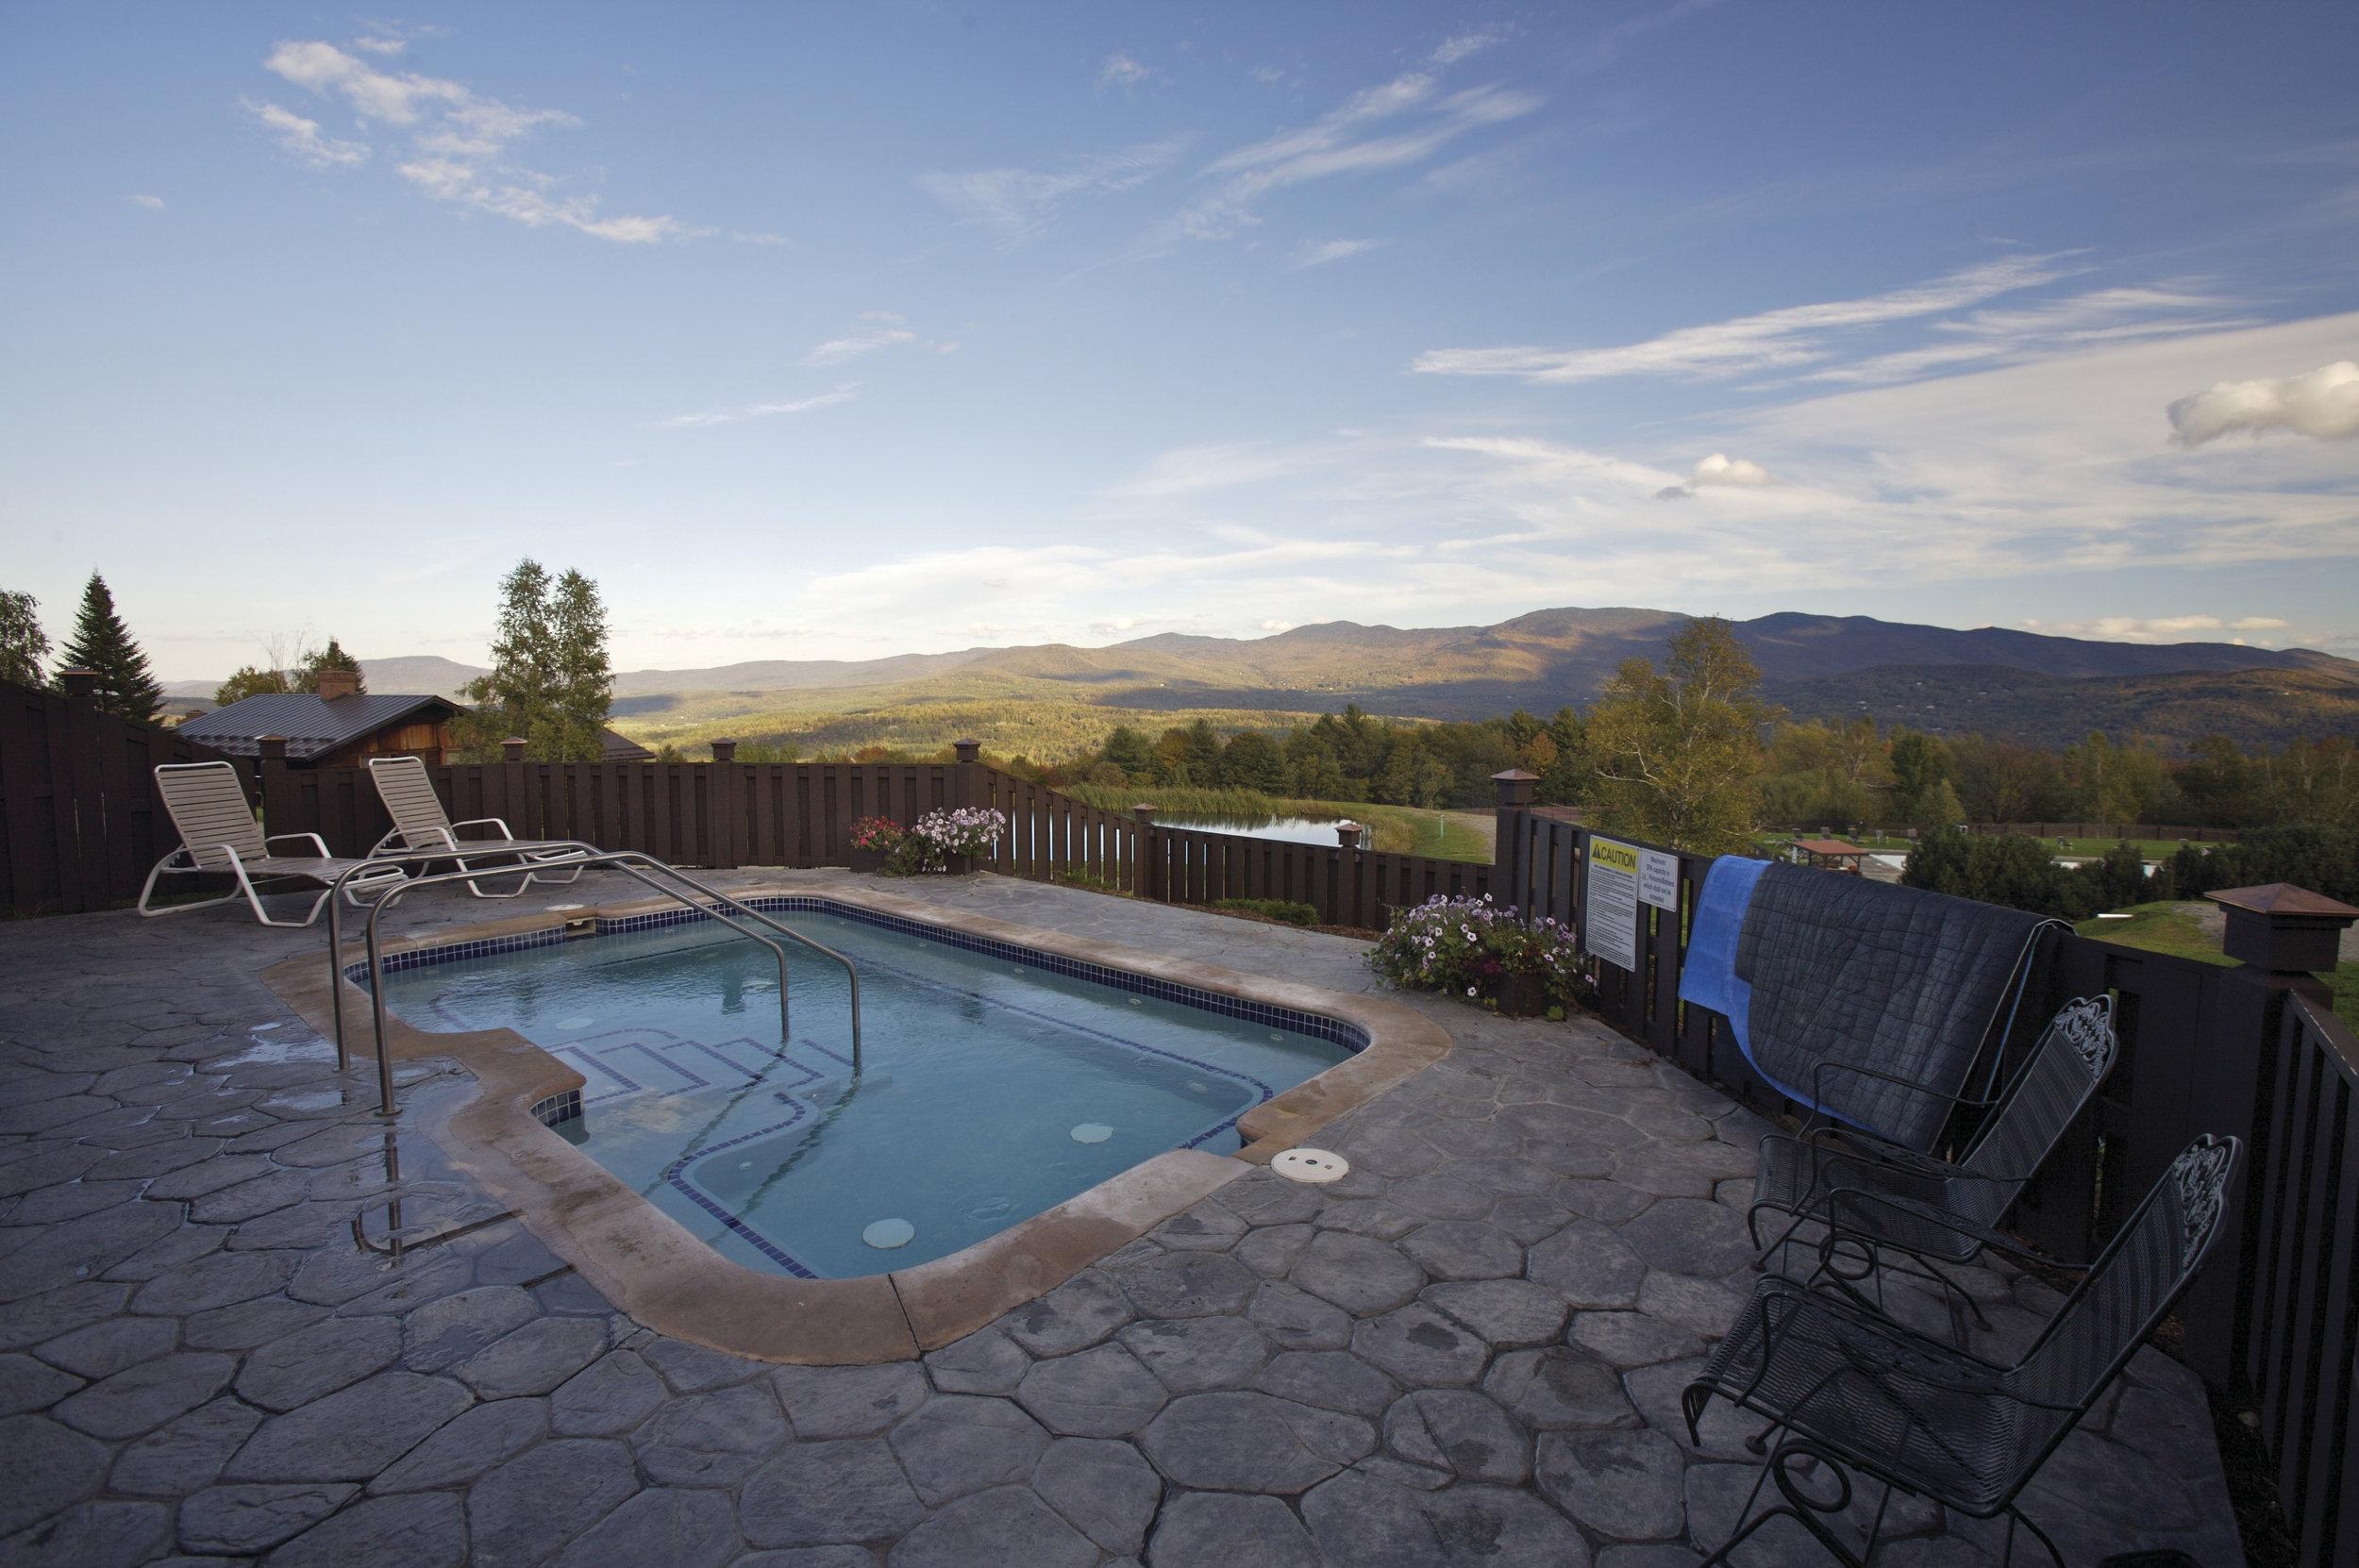 Hot Tub at Von Trapp Family Lodge